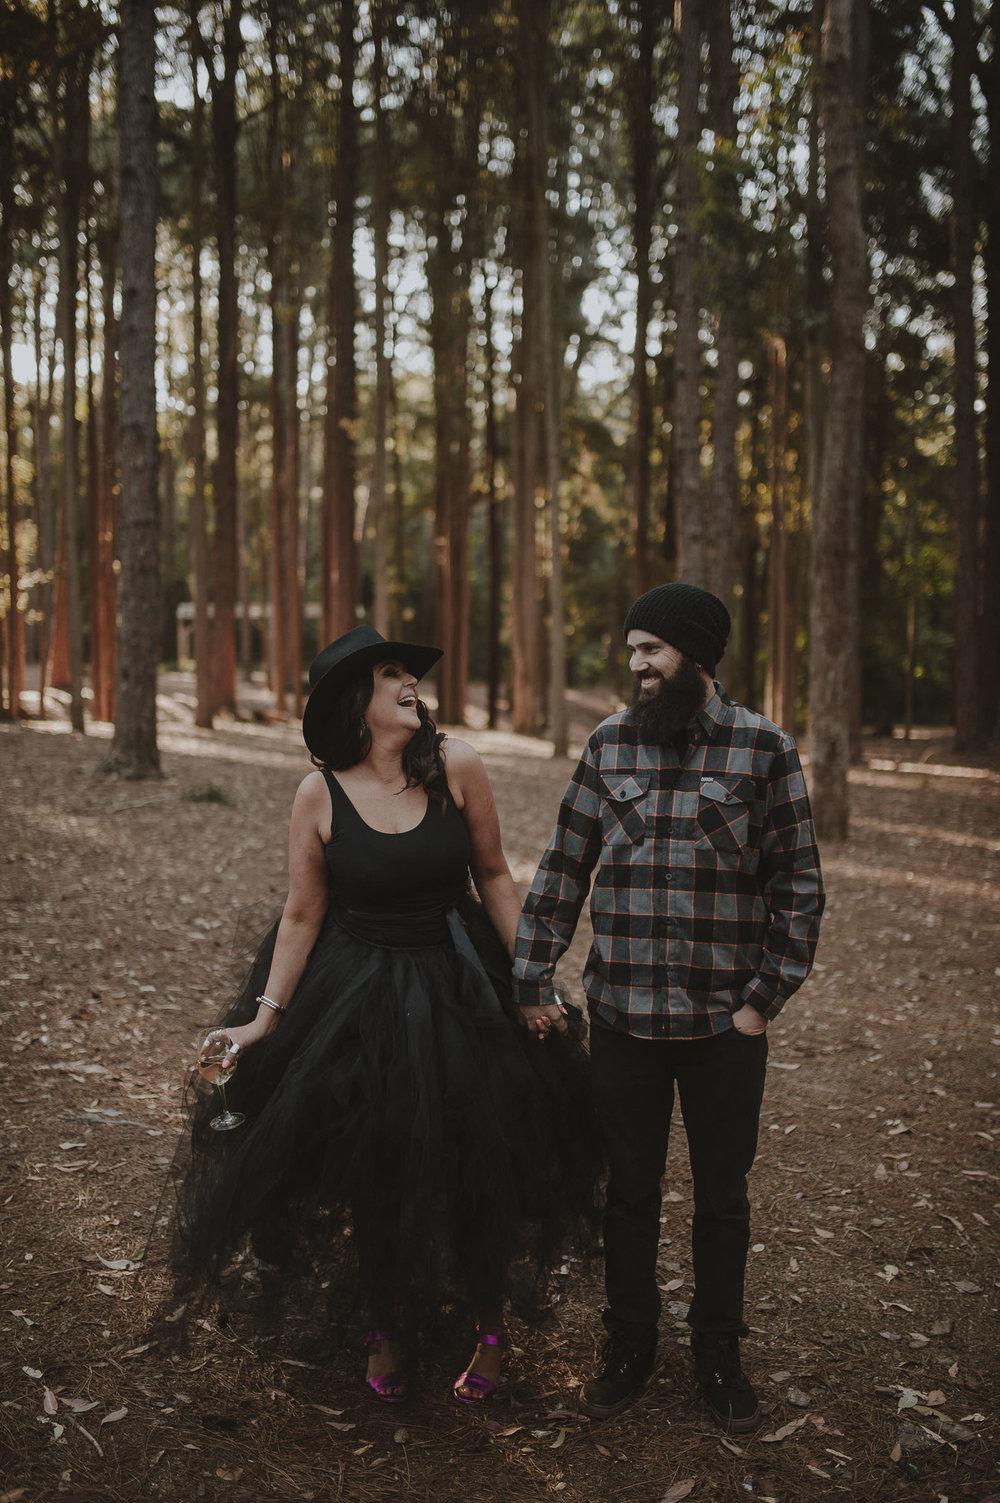 Madeline_Jamie_Watagens_Pine_Forest_Engagement_Shoot_Blog-22.jpg